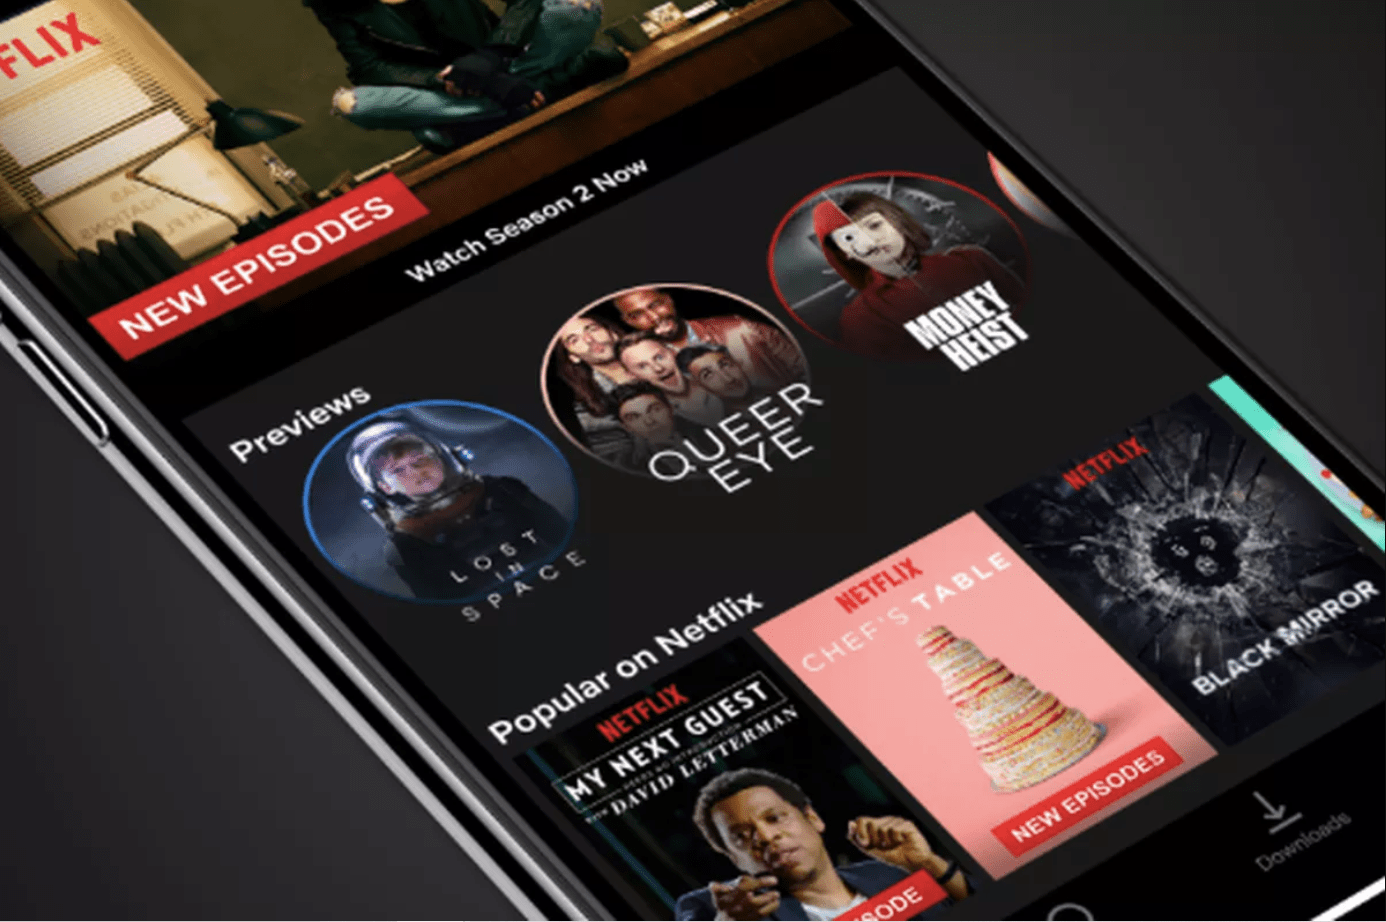 Netflix NodeJS App